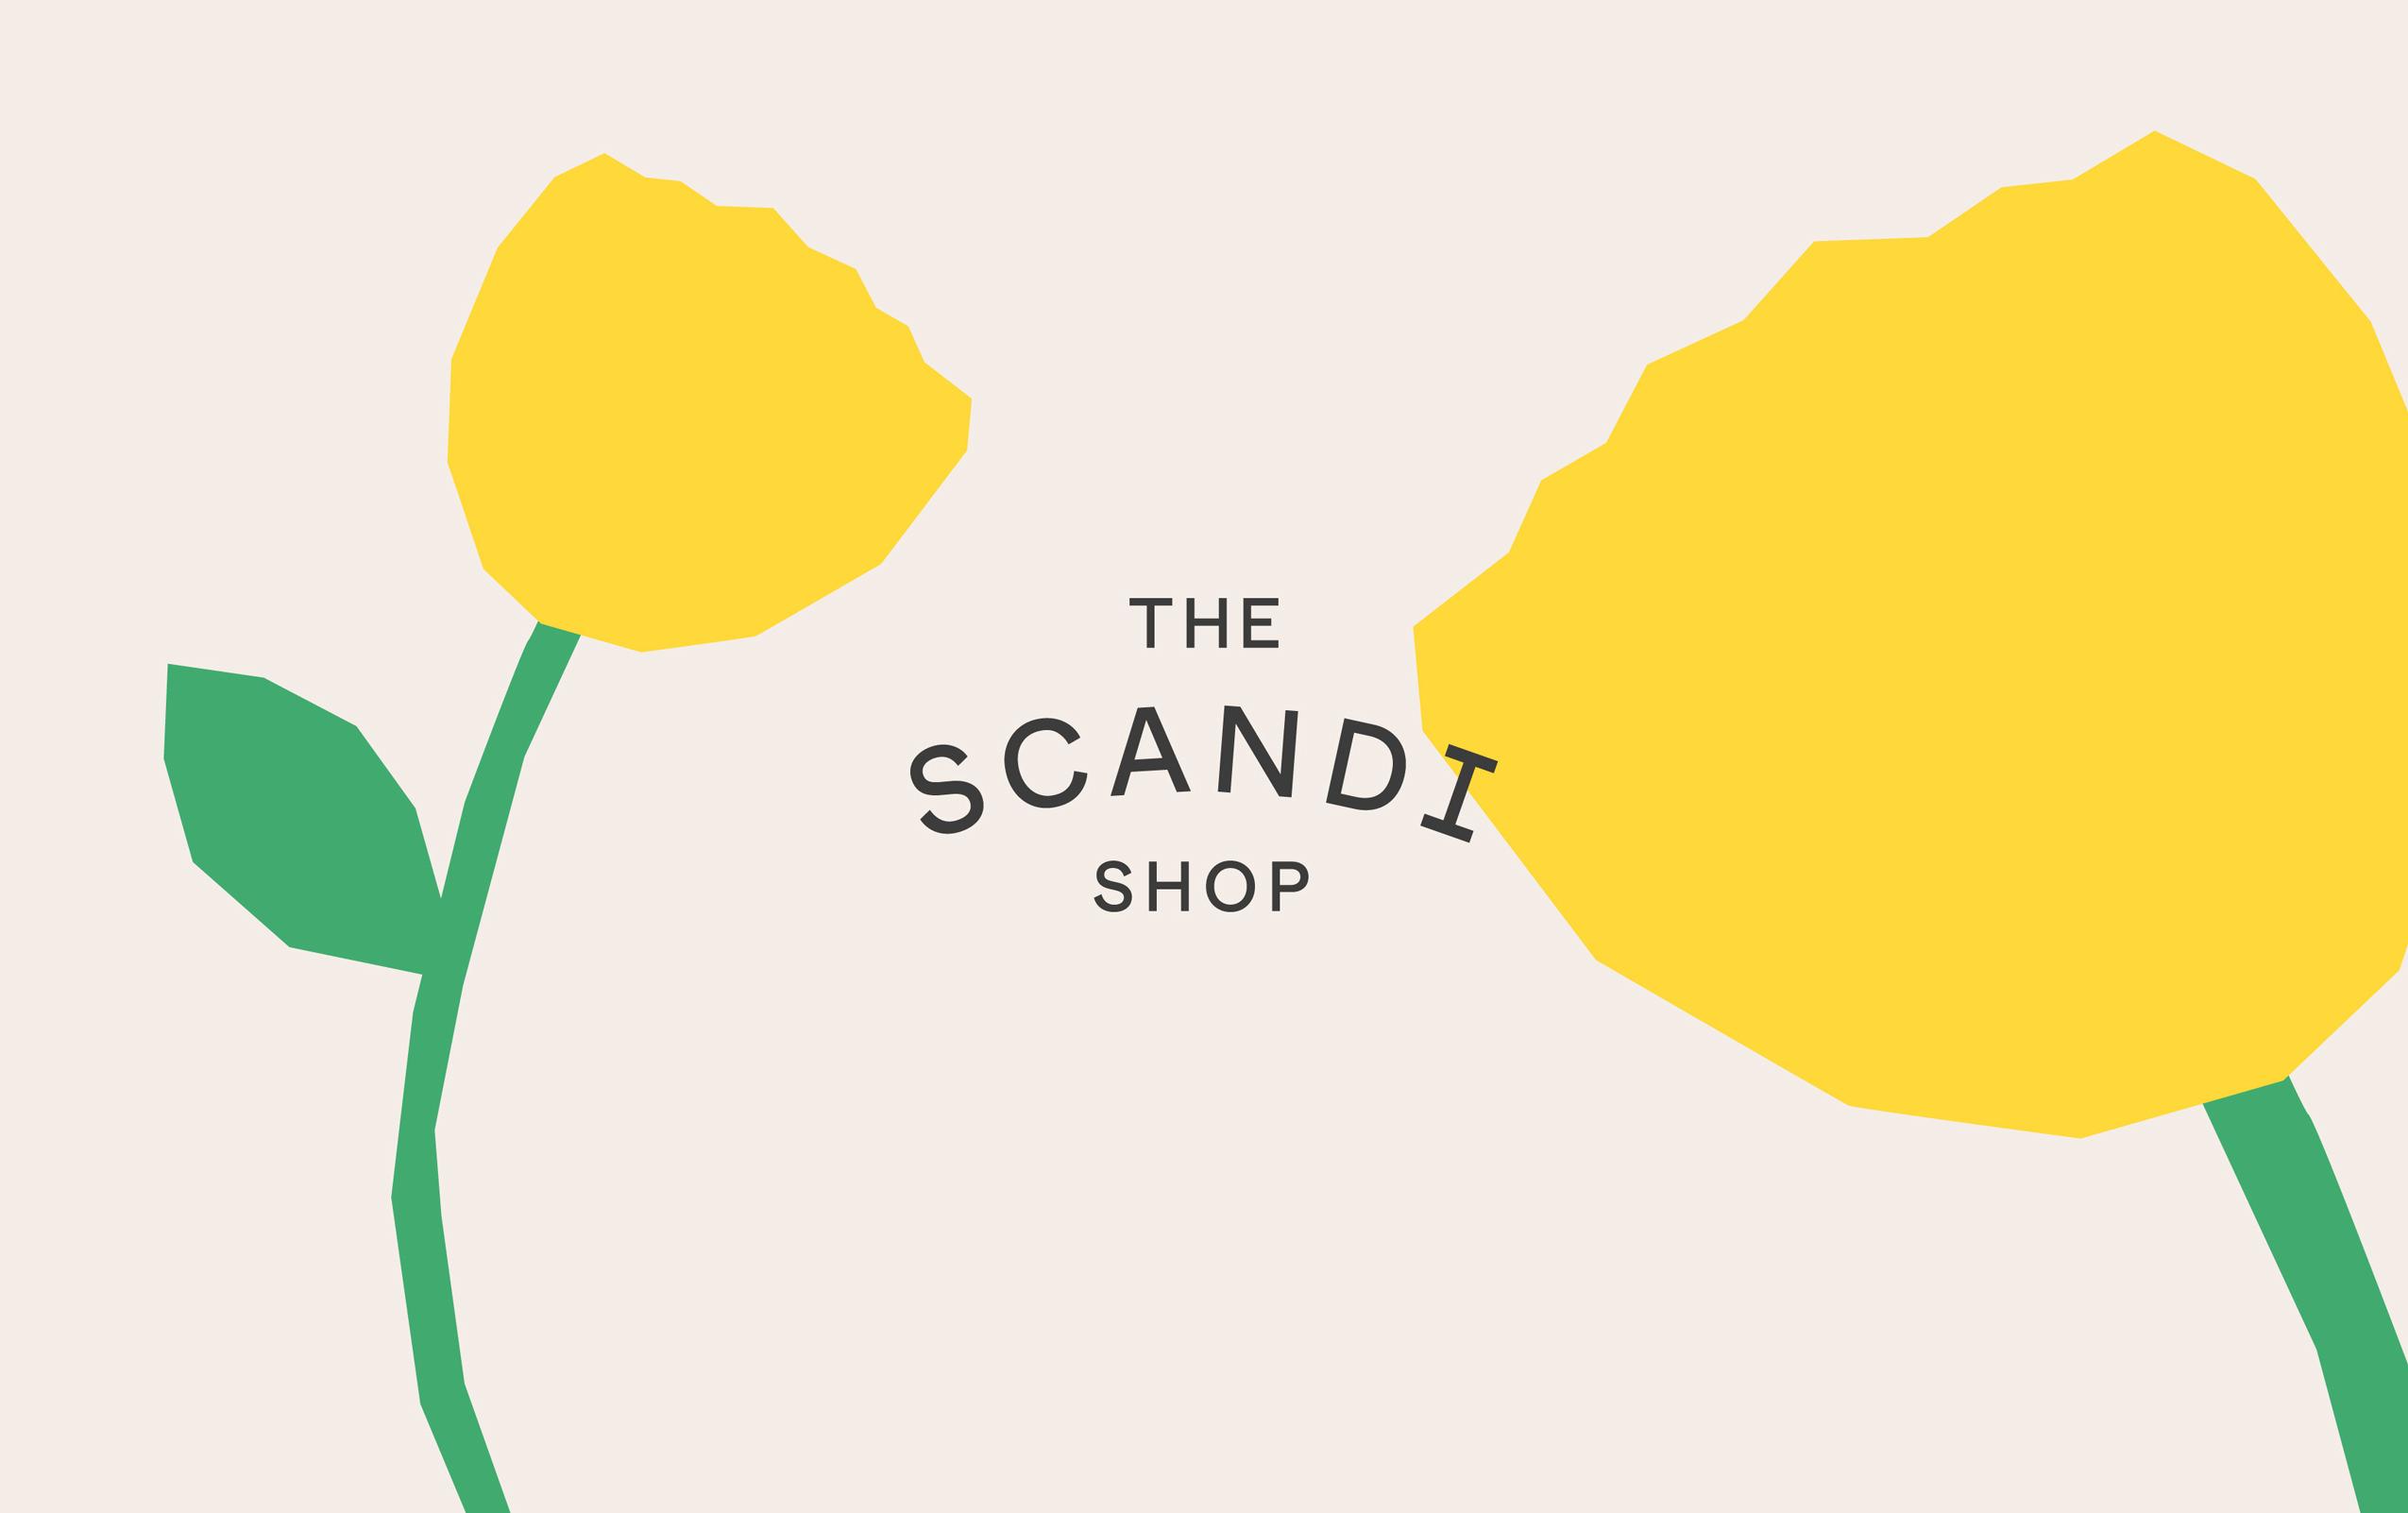 scandi-shop-branding-illustration